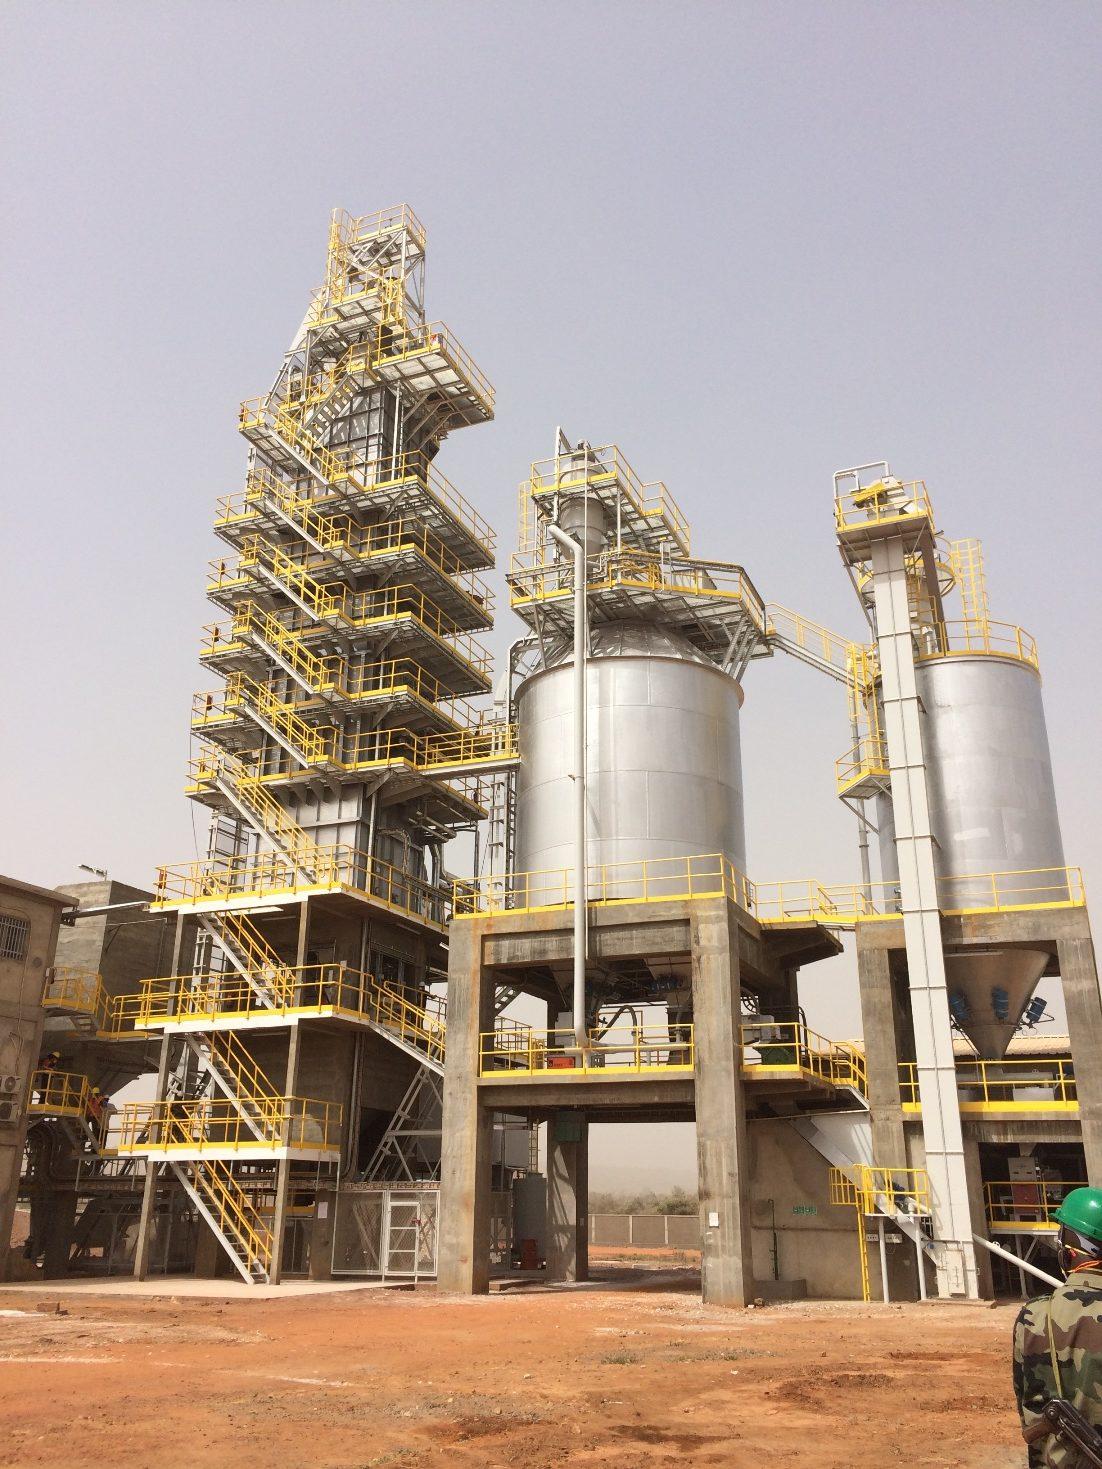 Mali industrial processing